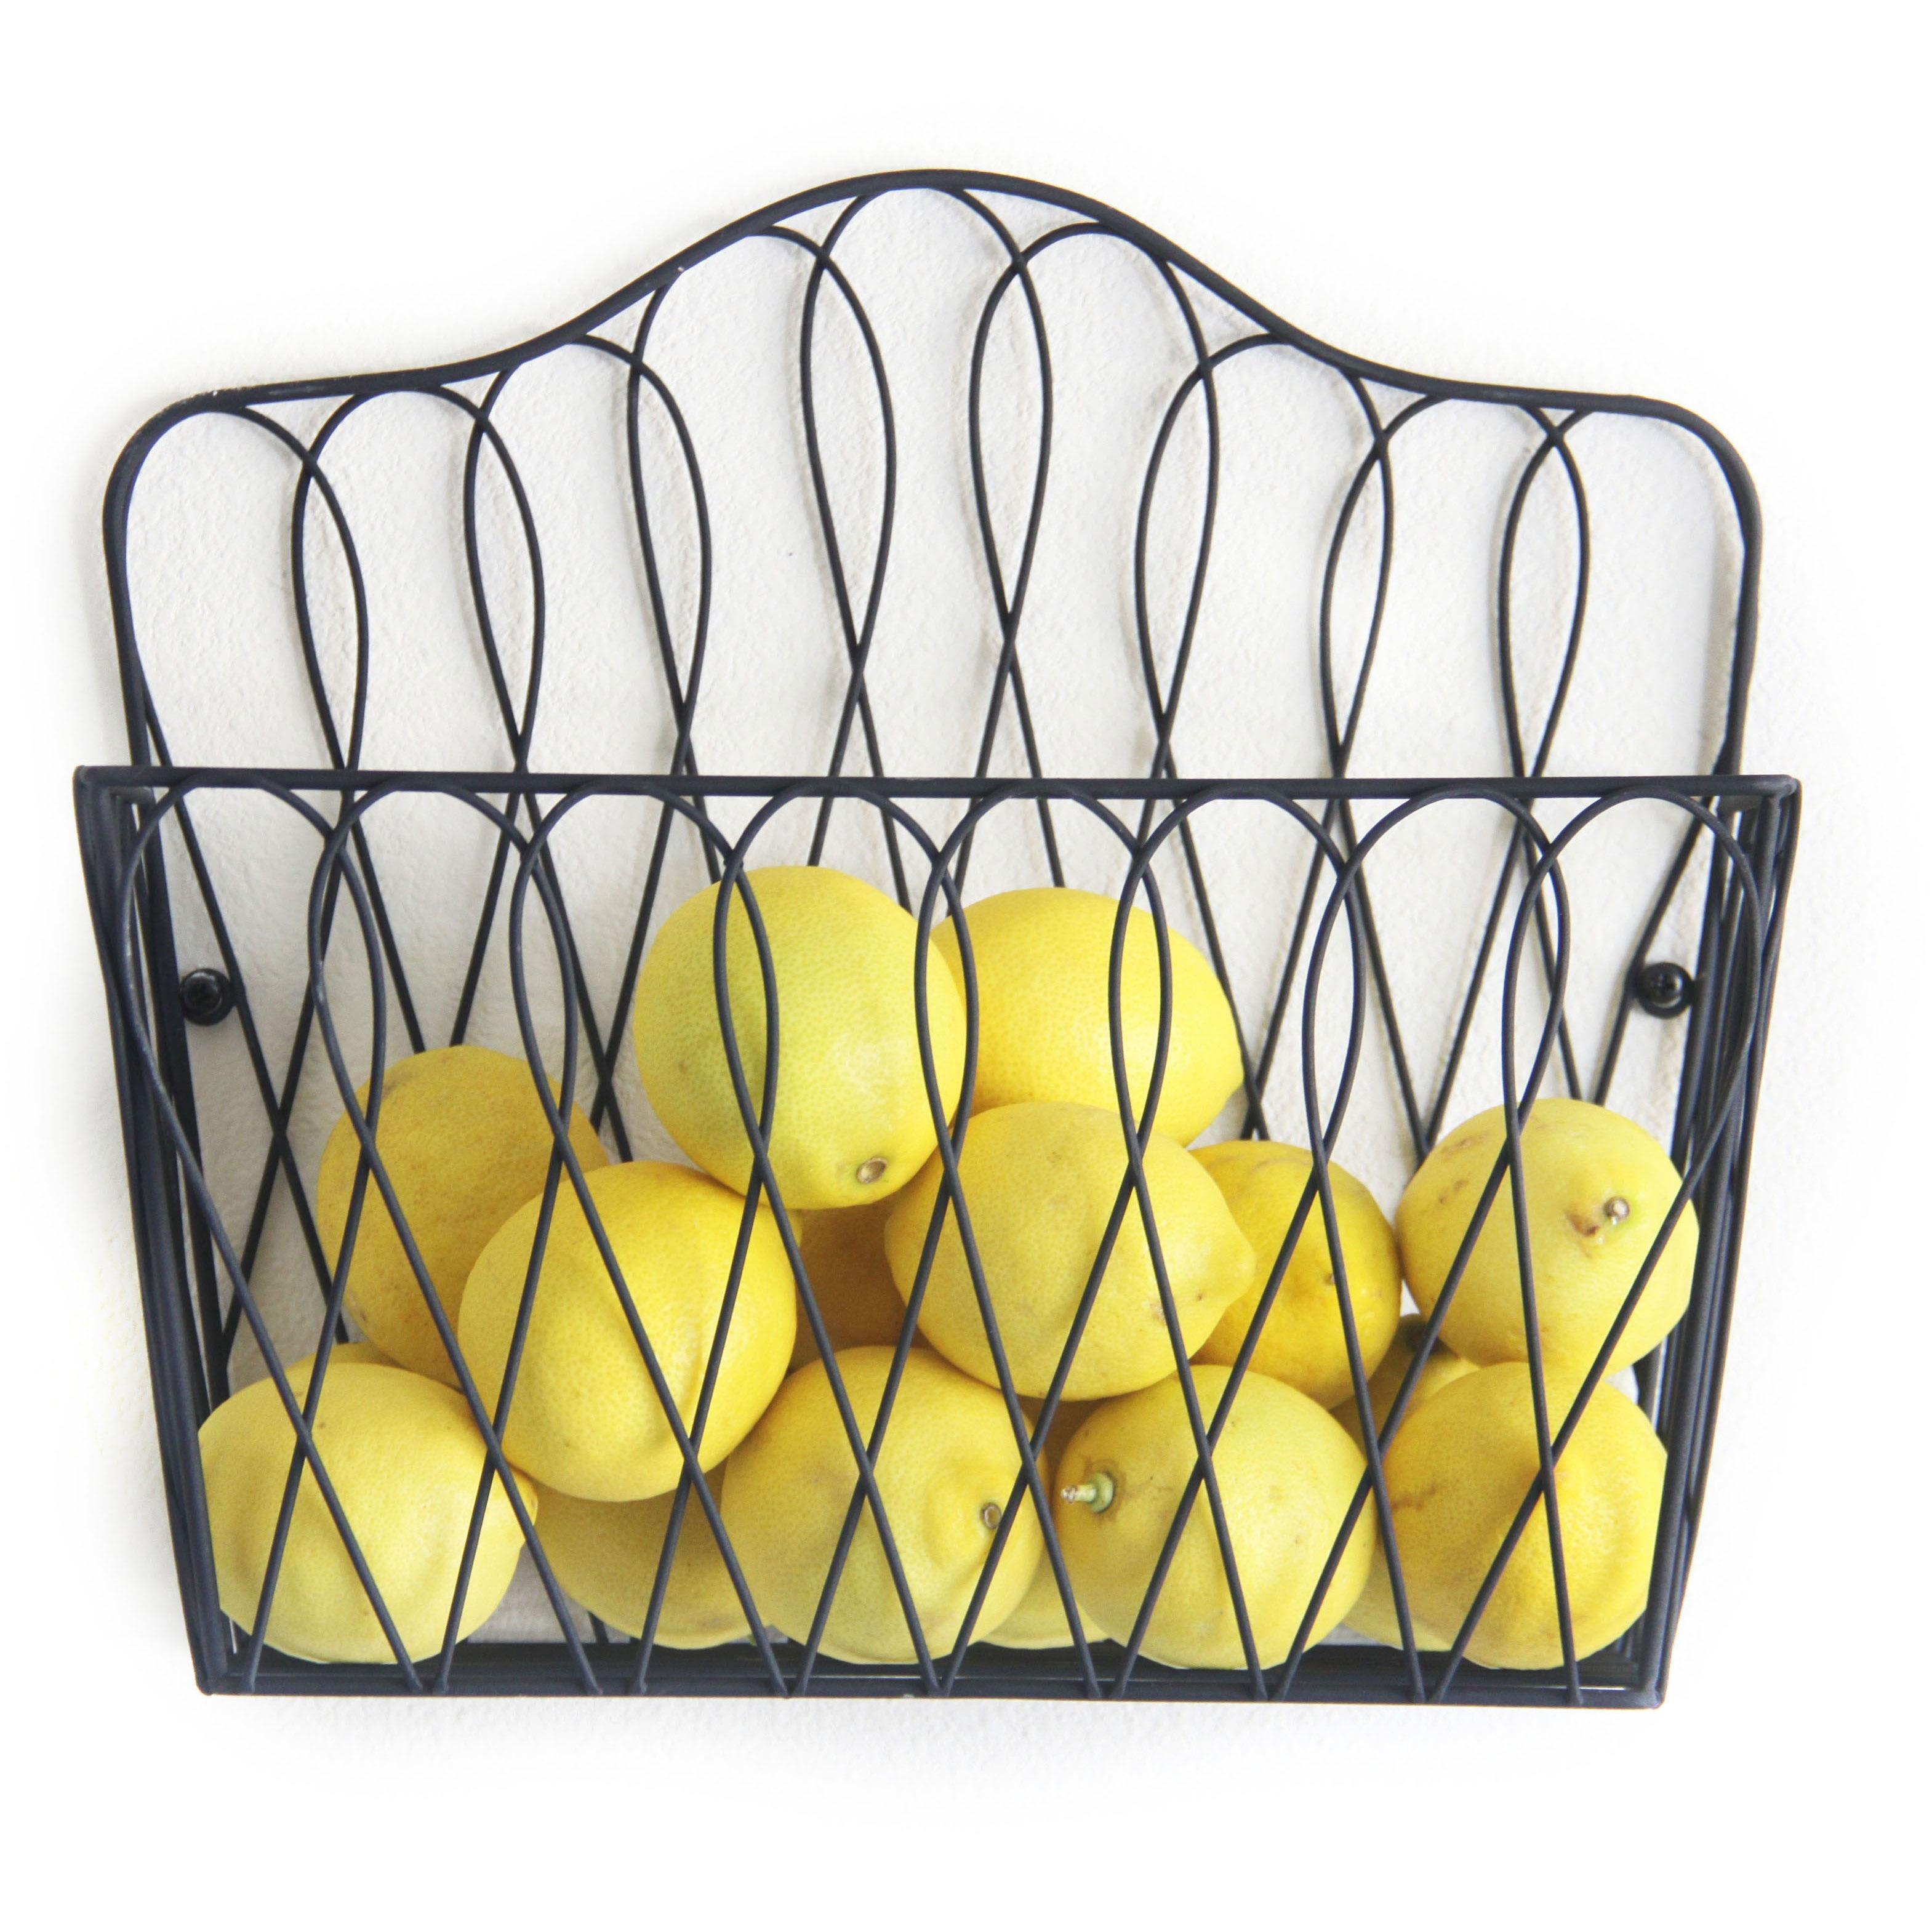 Shop Wall-mounted Magazine Rack Fruit Basket - Free Shipping On ...